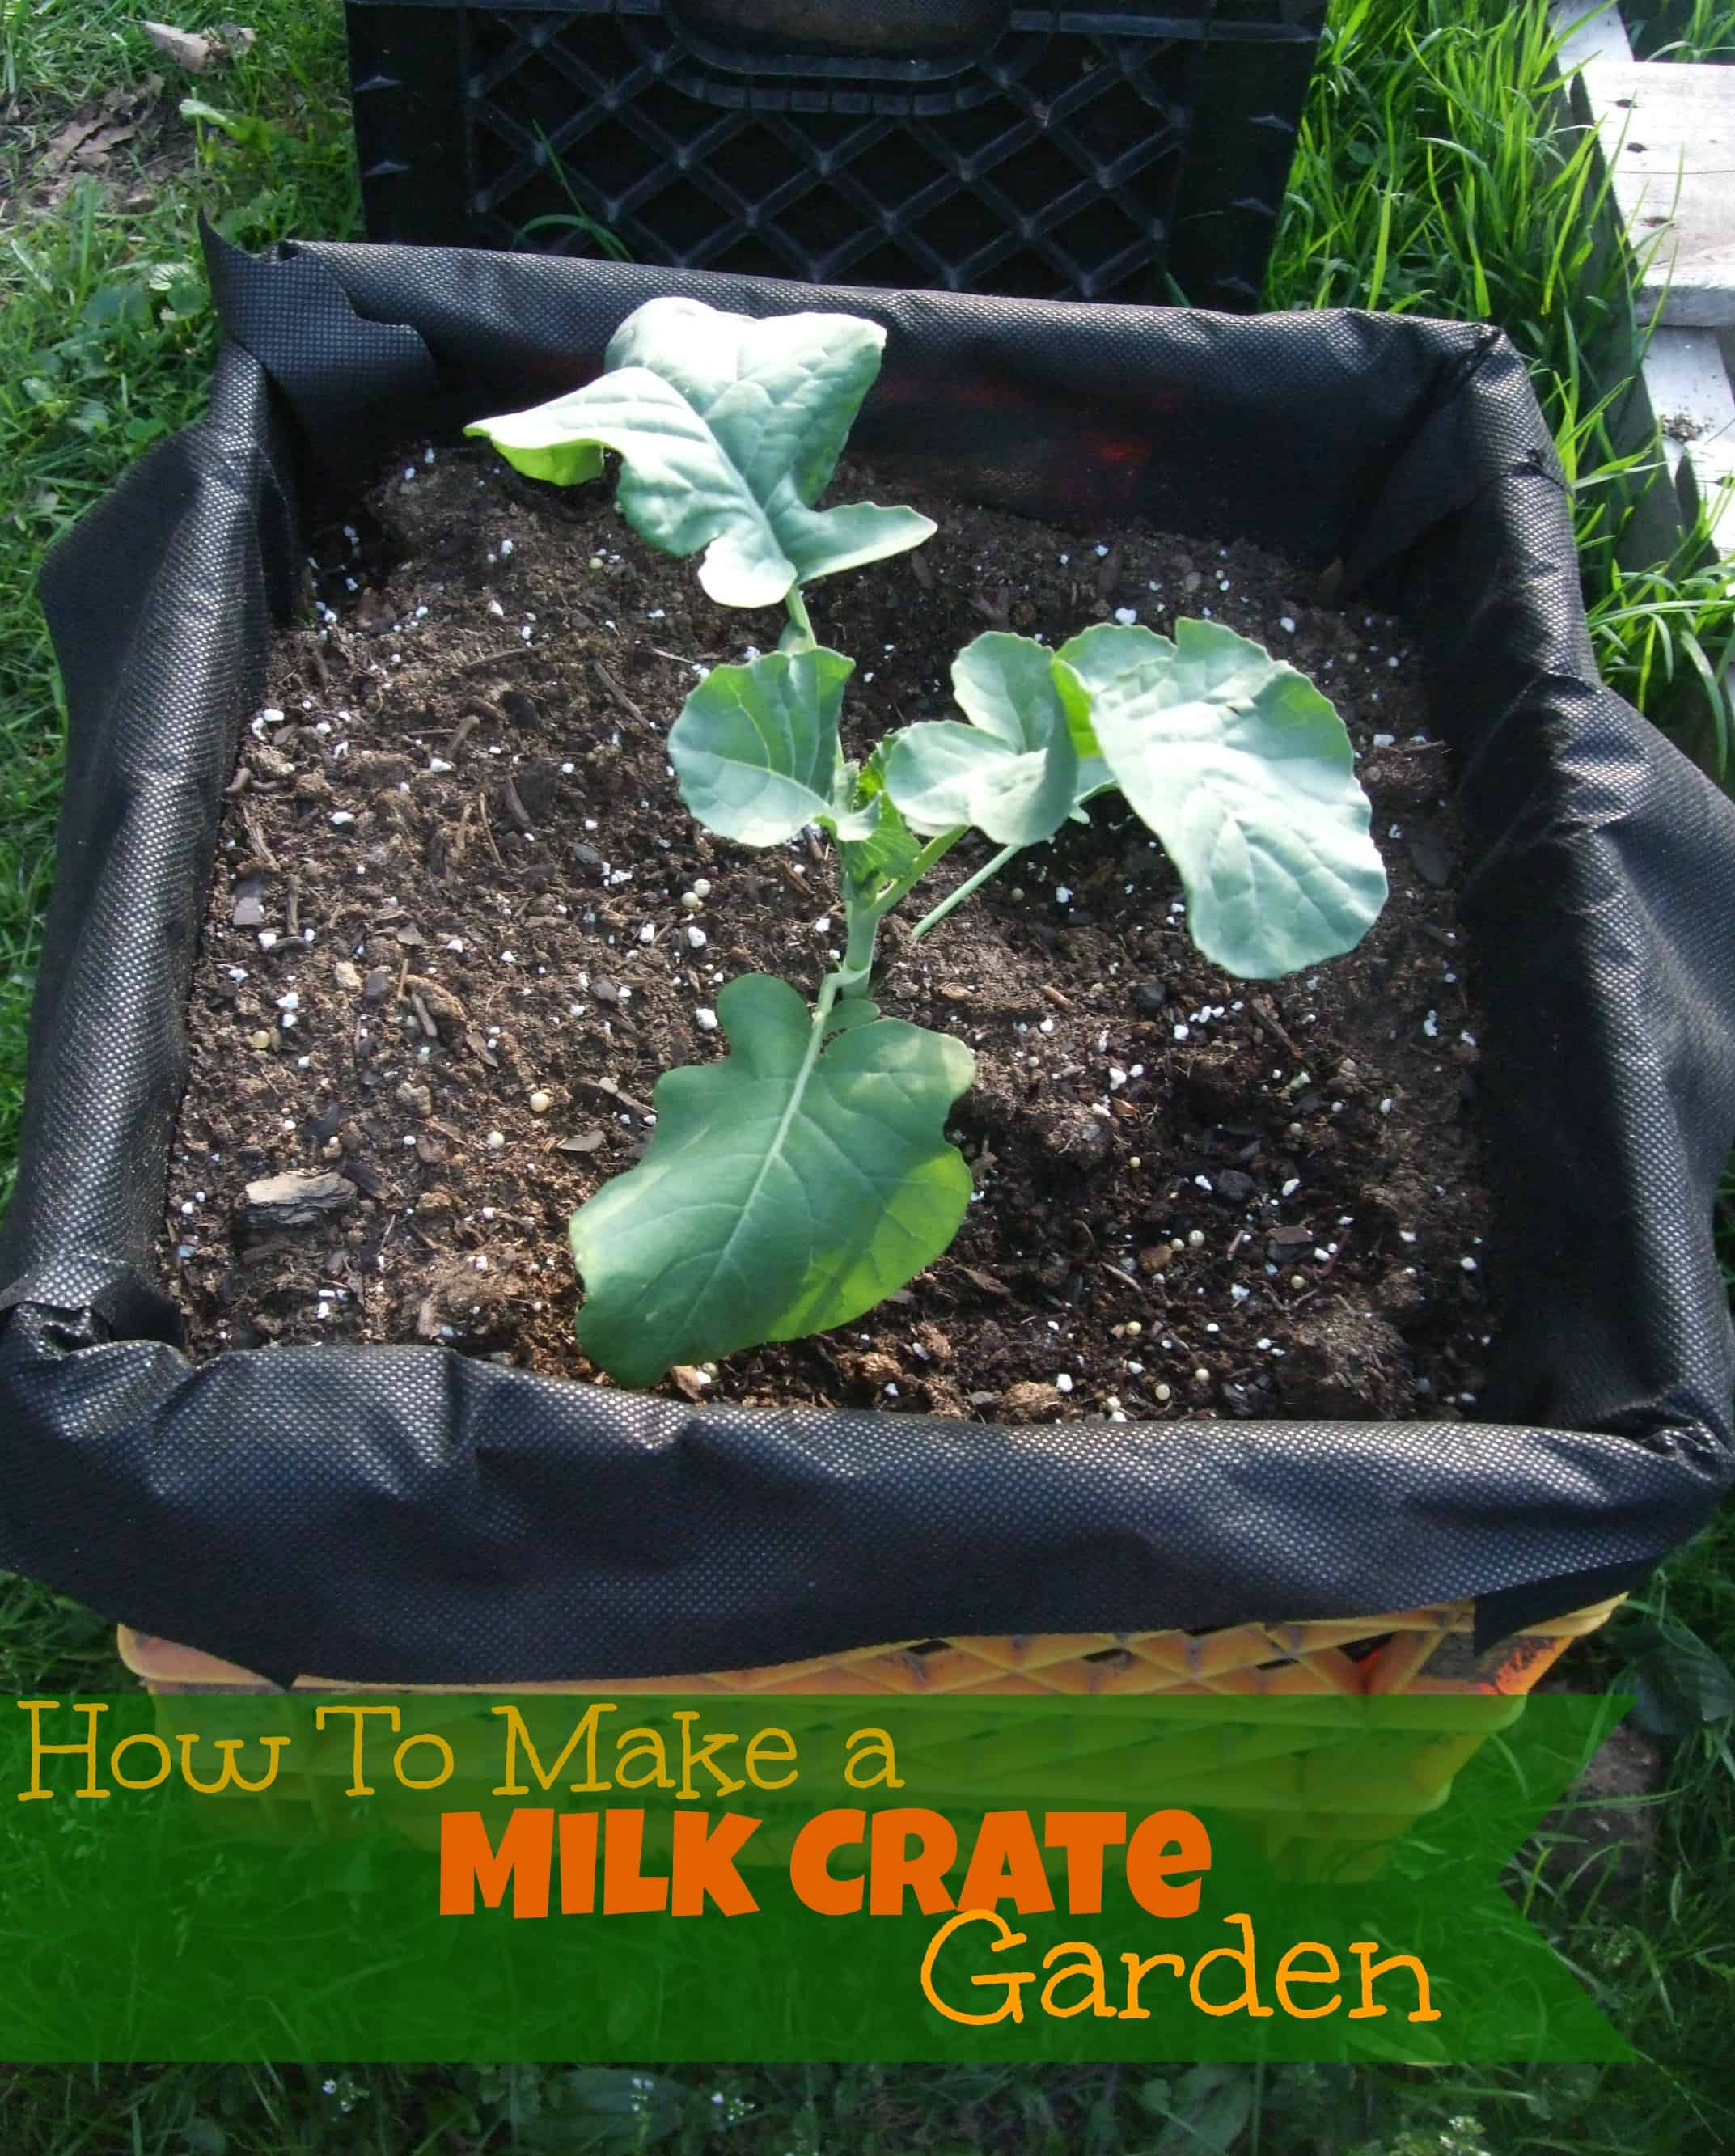 how to make a milk crate garden